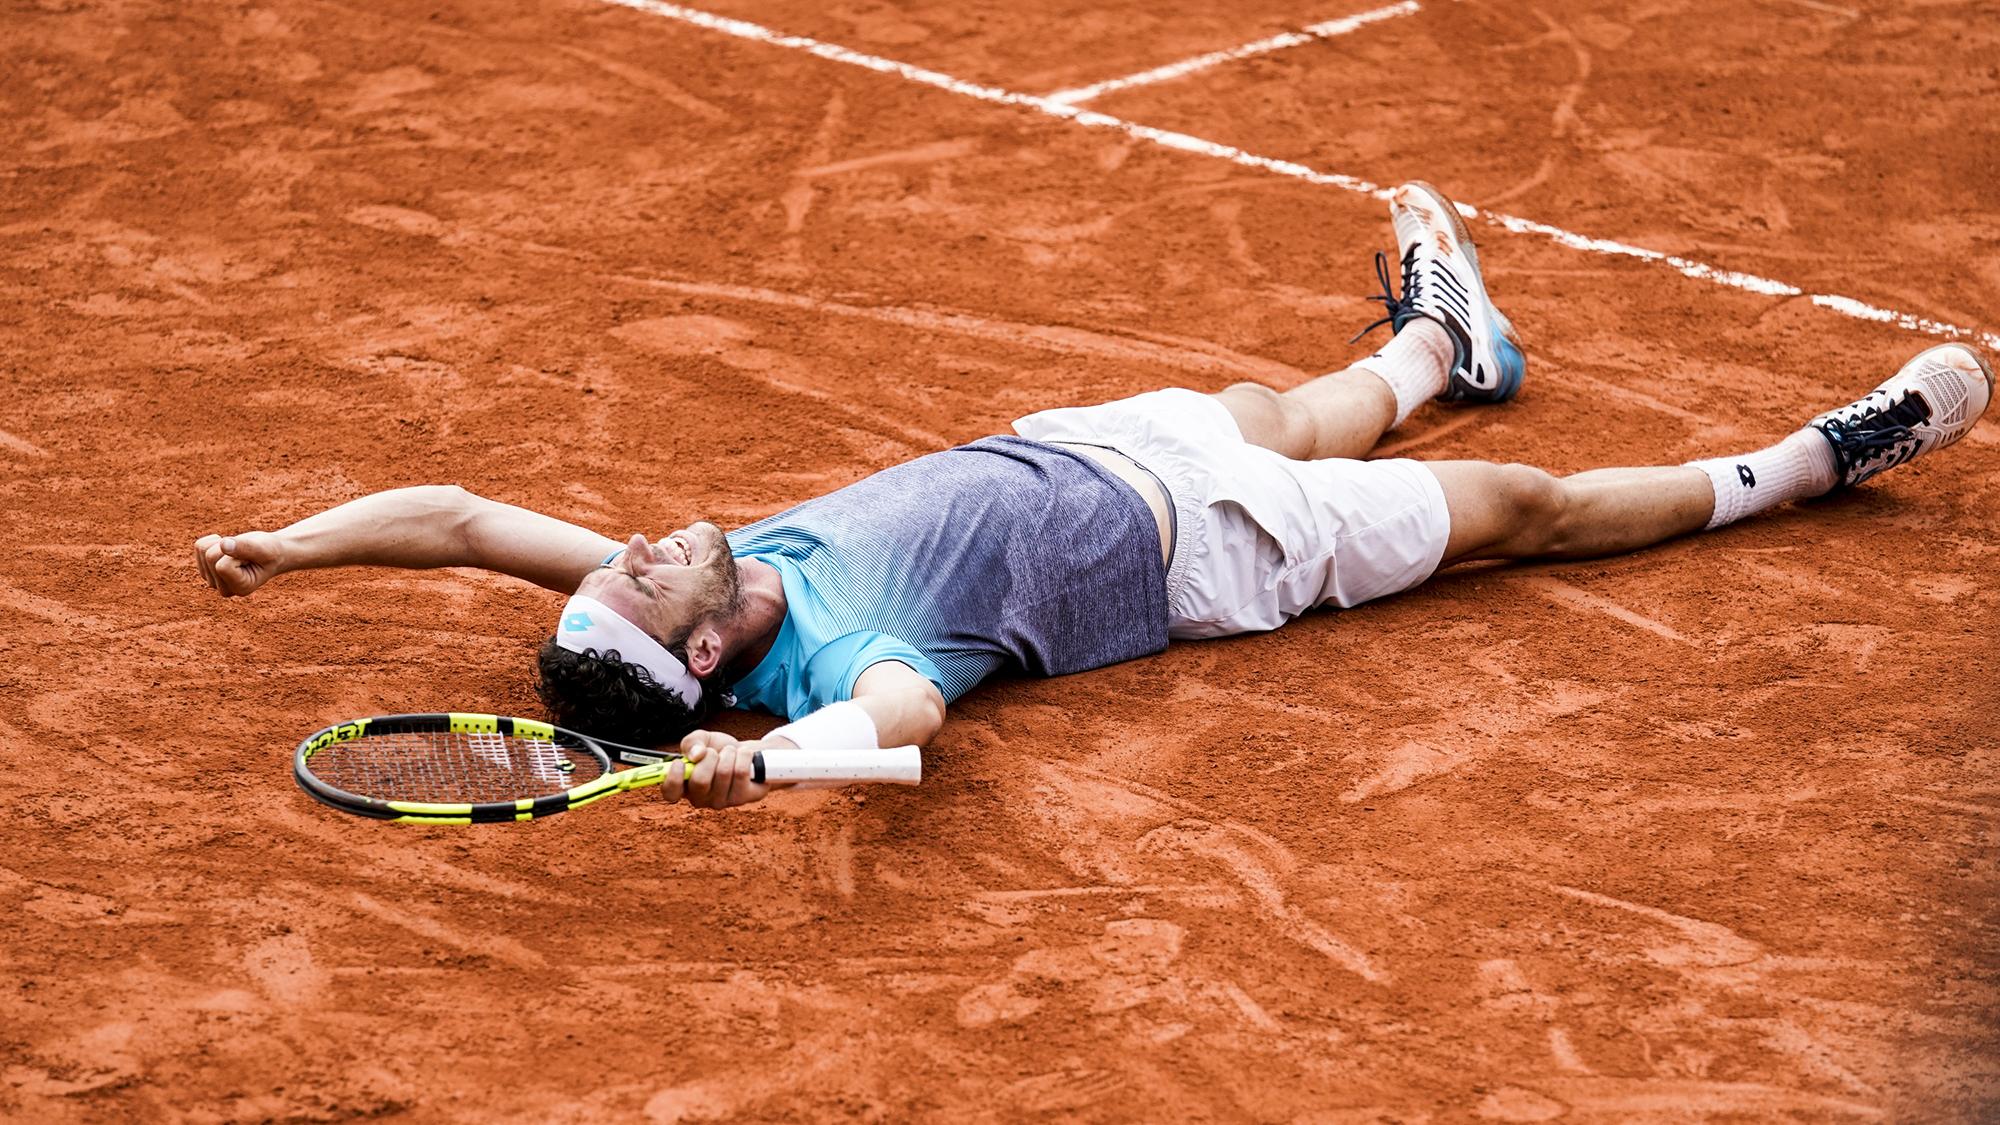 Marco Cecchinato Novak Djokovic French Open Roland Garros